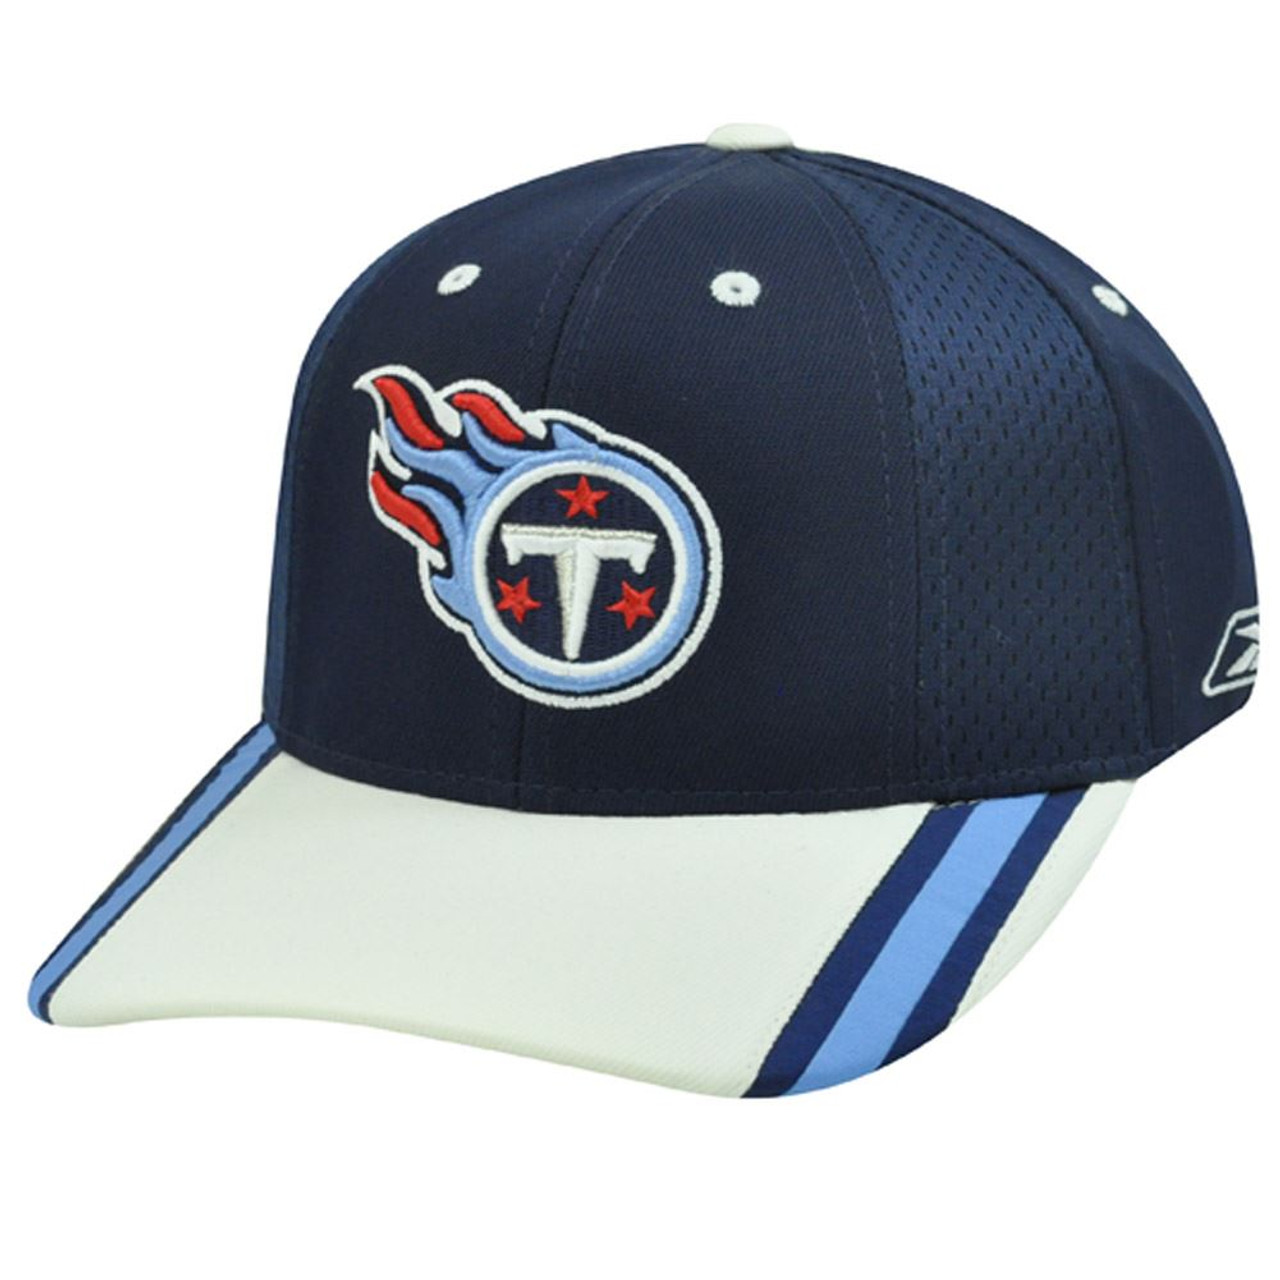 sale retailer 002c6 e91b0 NFL REEBOK TENNESSEE TITANS FIELD NYLON CAP HAT ADJ BLU